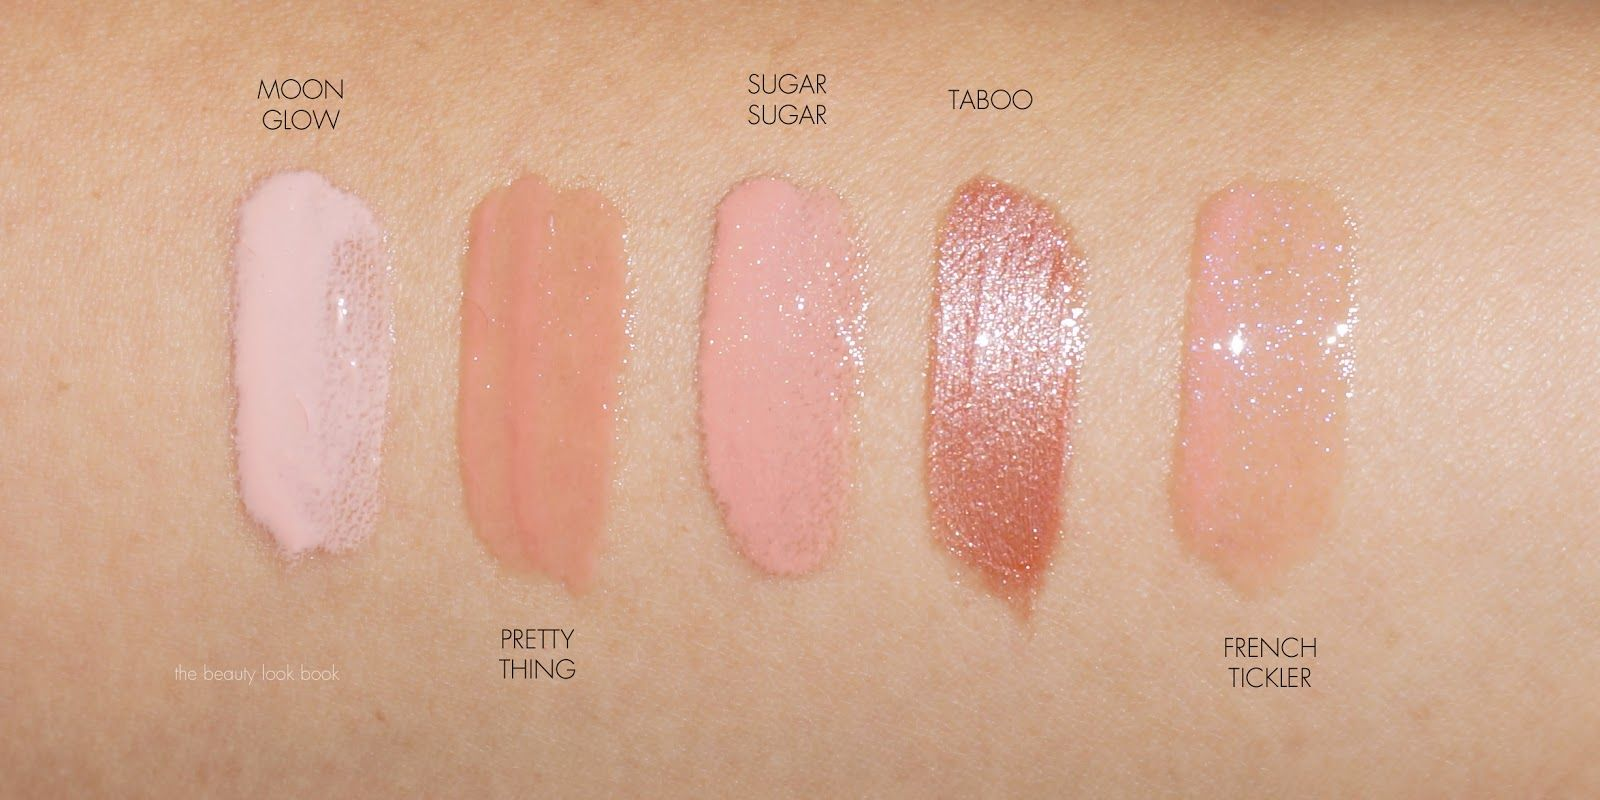 Enamored Lip Hi-Shine Gloss Lip Lacquer by Marc Jacobs Beauty #18